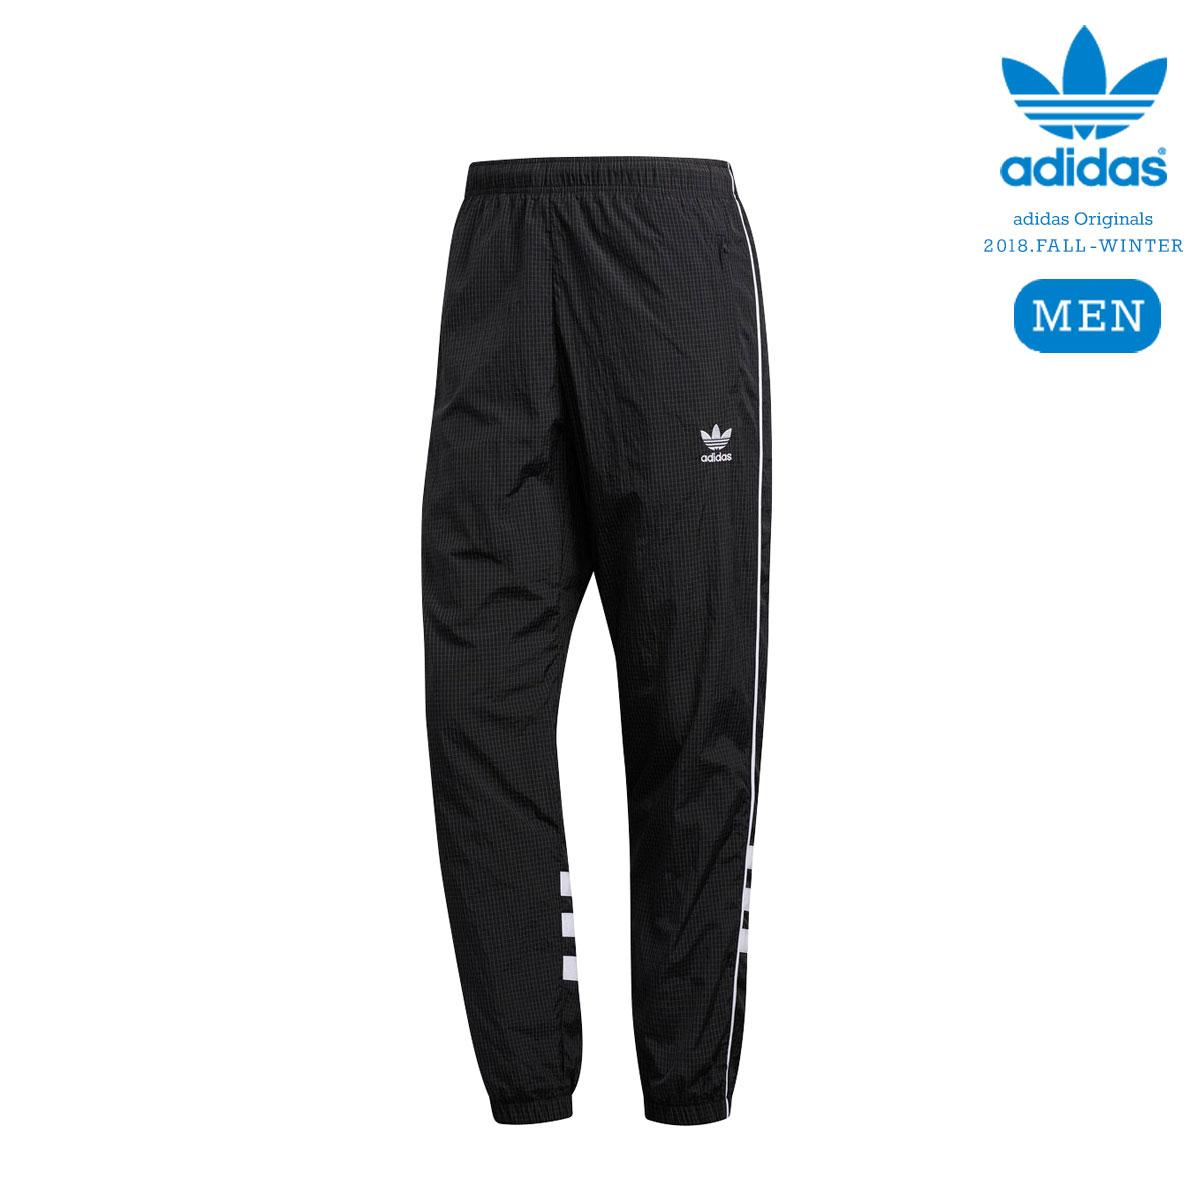 adidas Originals AUTH RIPSTOP TRACK PANTS (Black) 【メンズサイズ】【18FW-I】